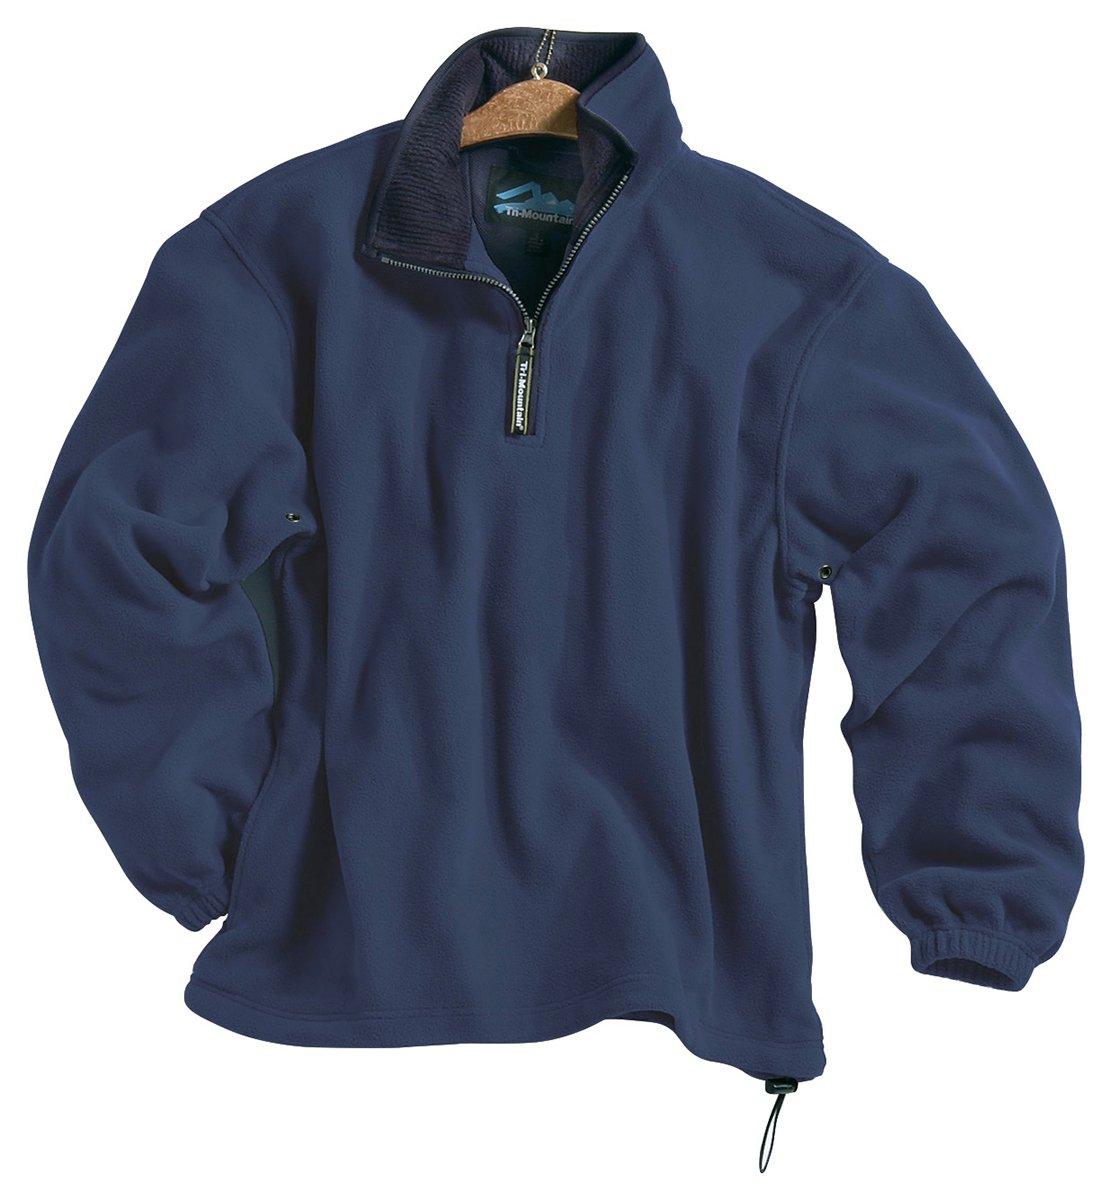 Tri-mountain Micro fleece 1/4 zip pullover. 7100TM - NAVY / NAVY_L